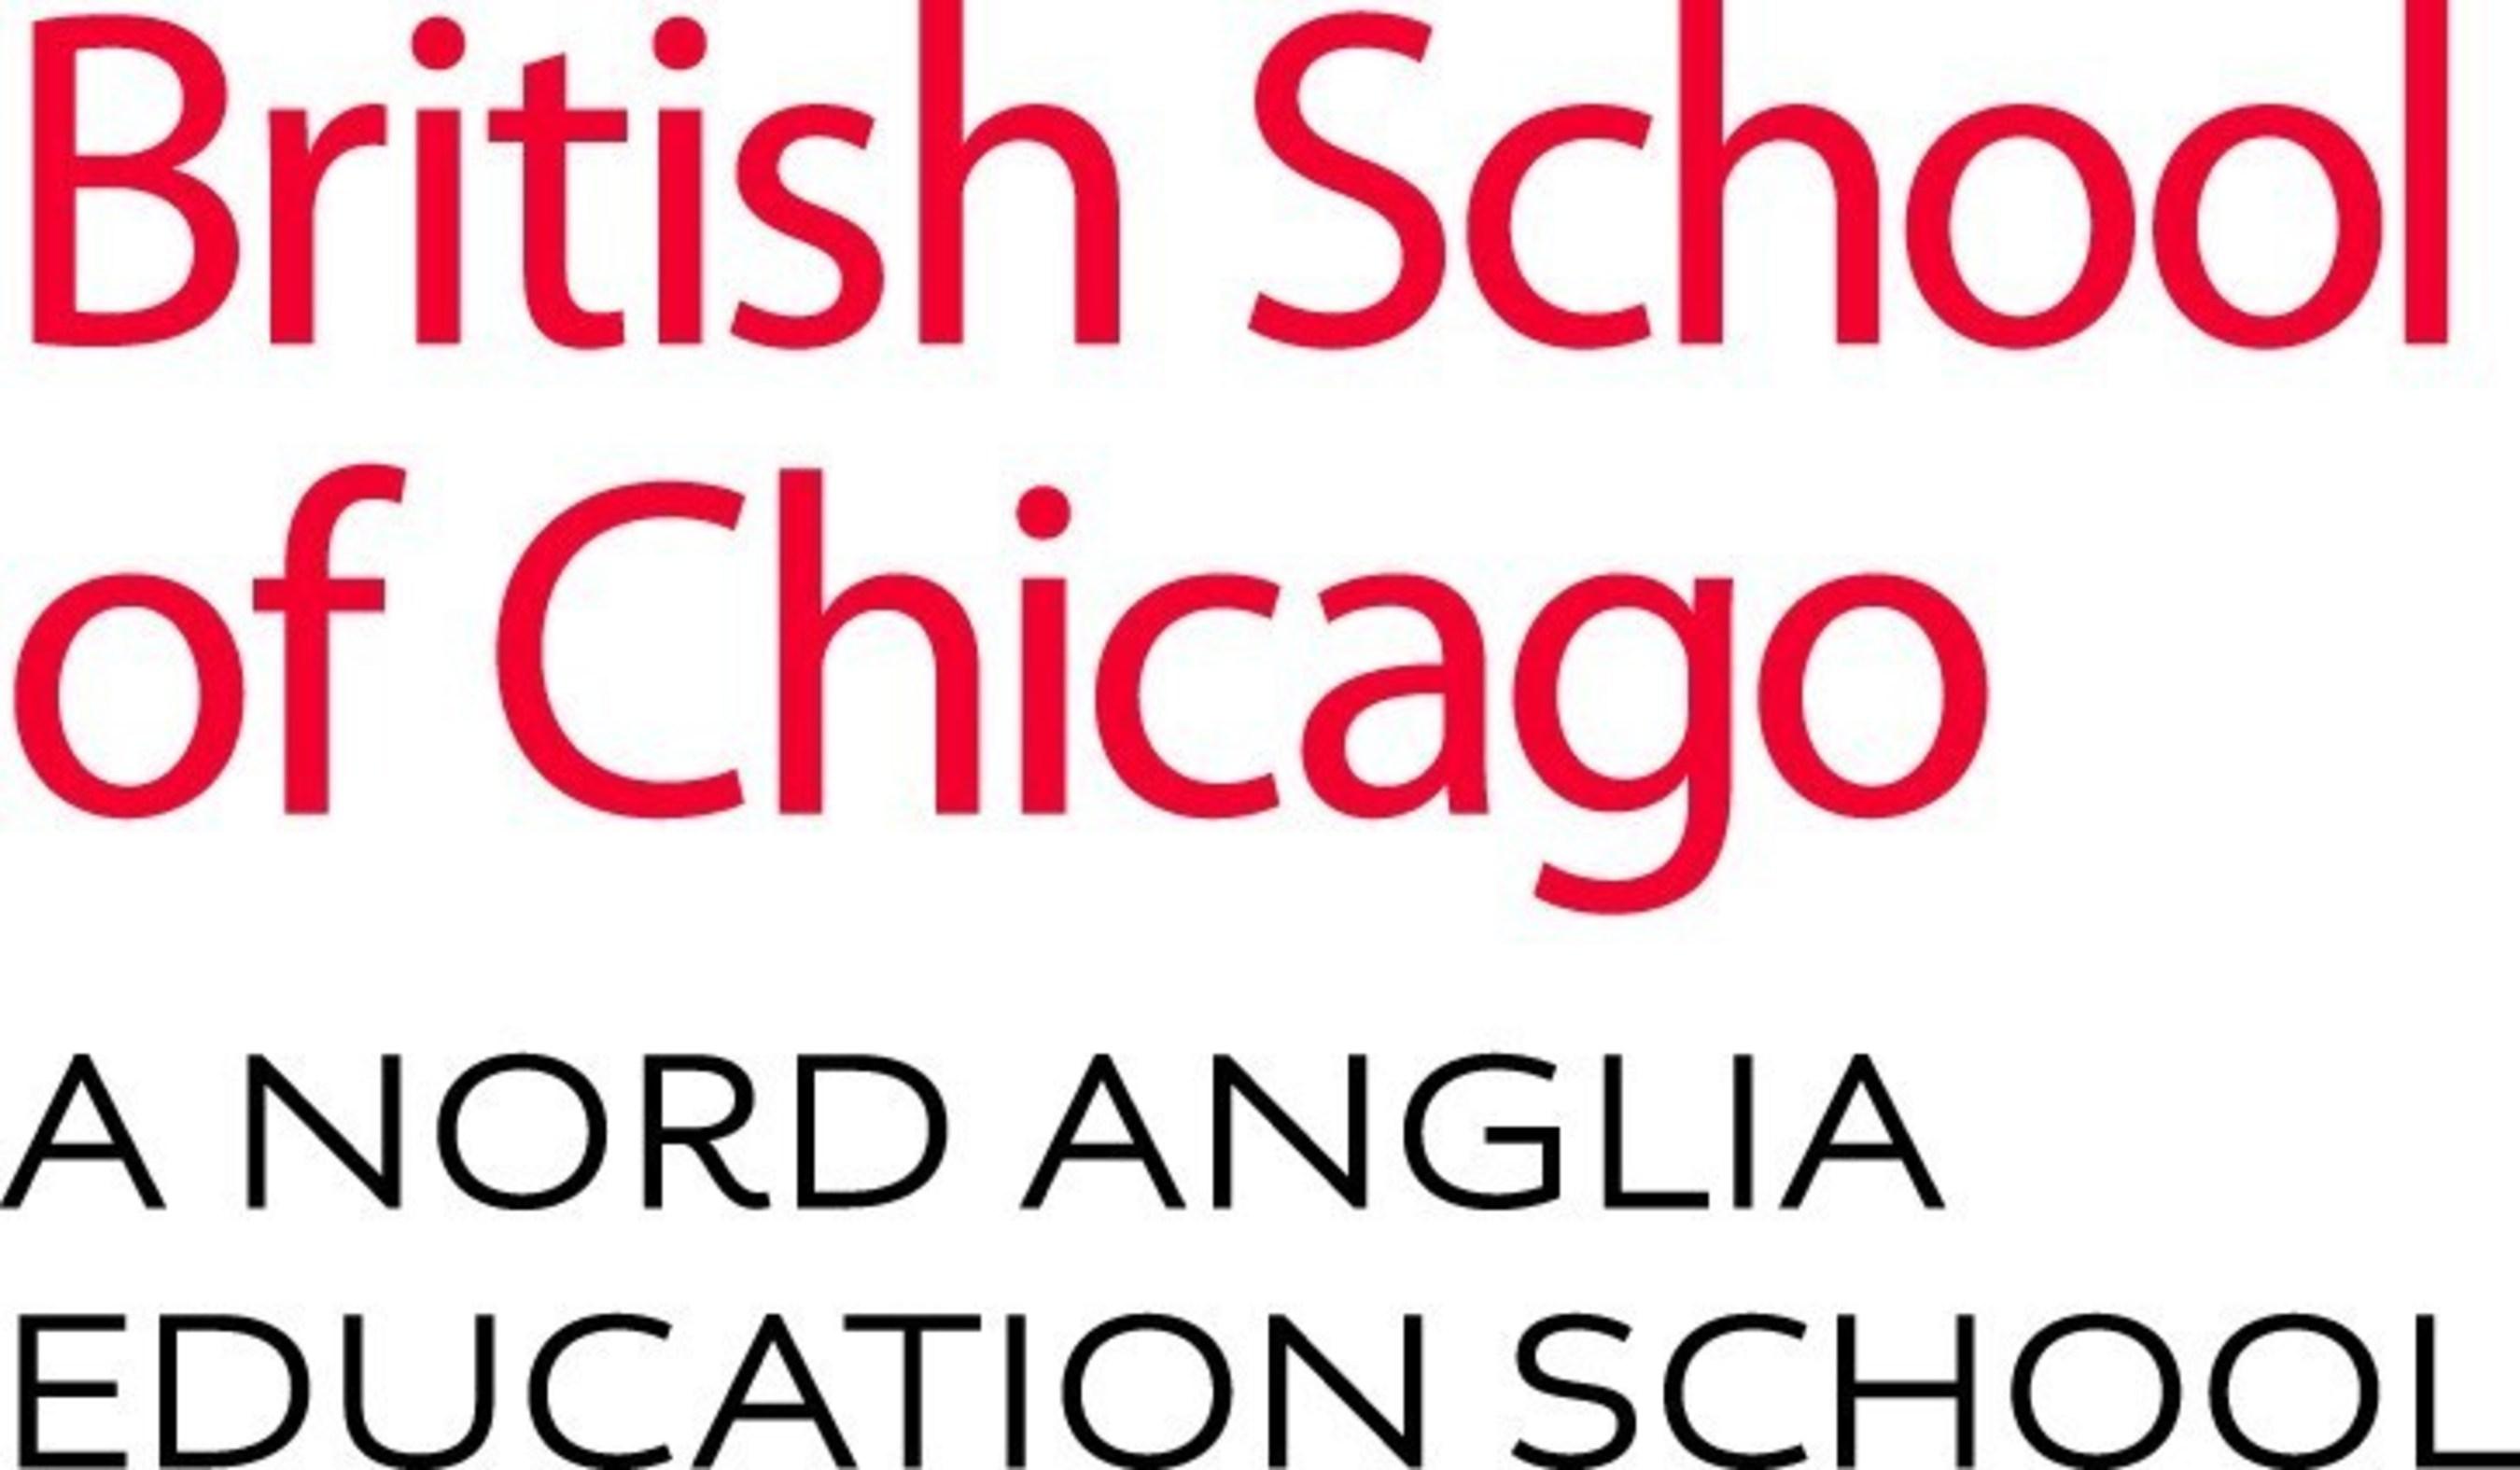 British School of Chicago